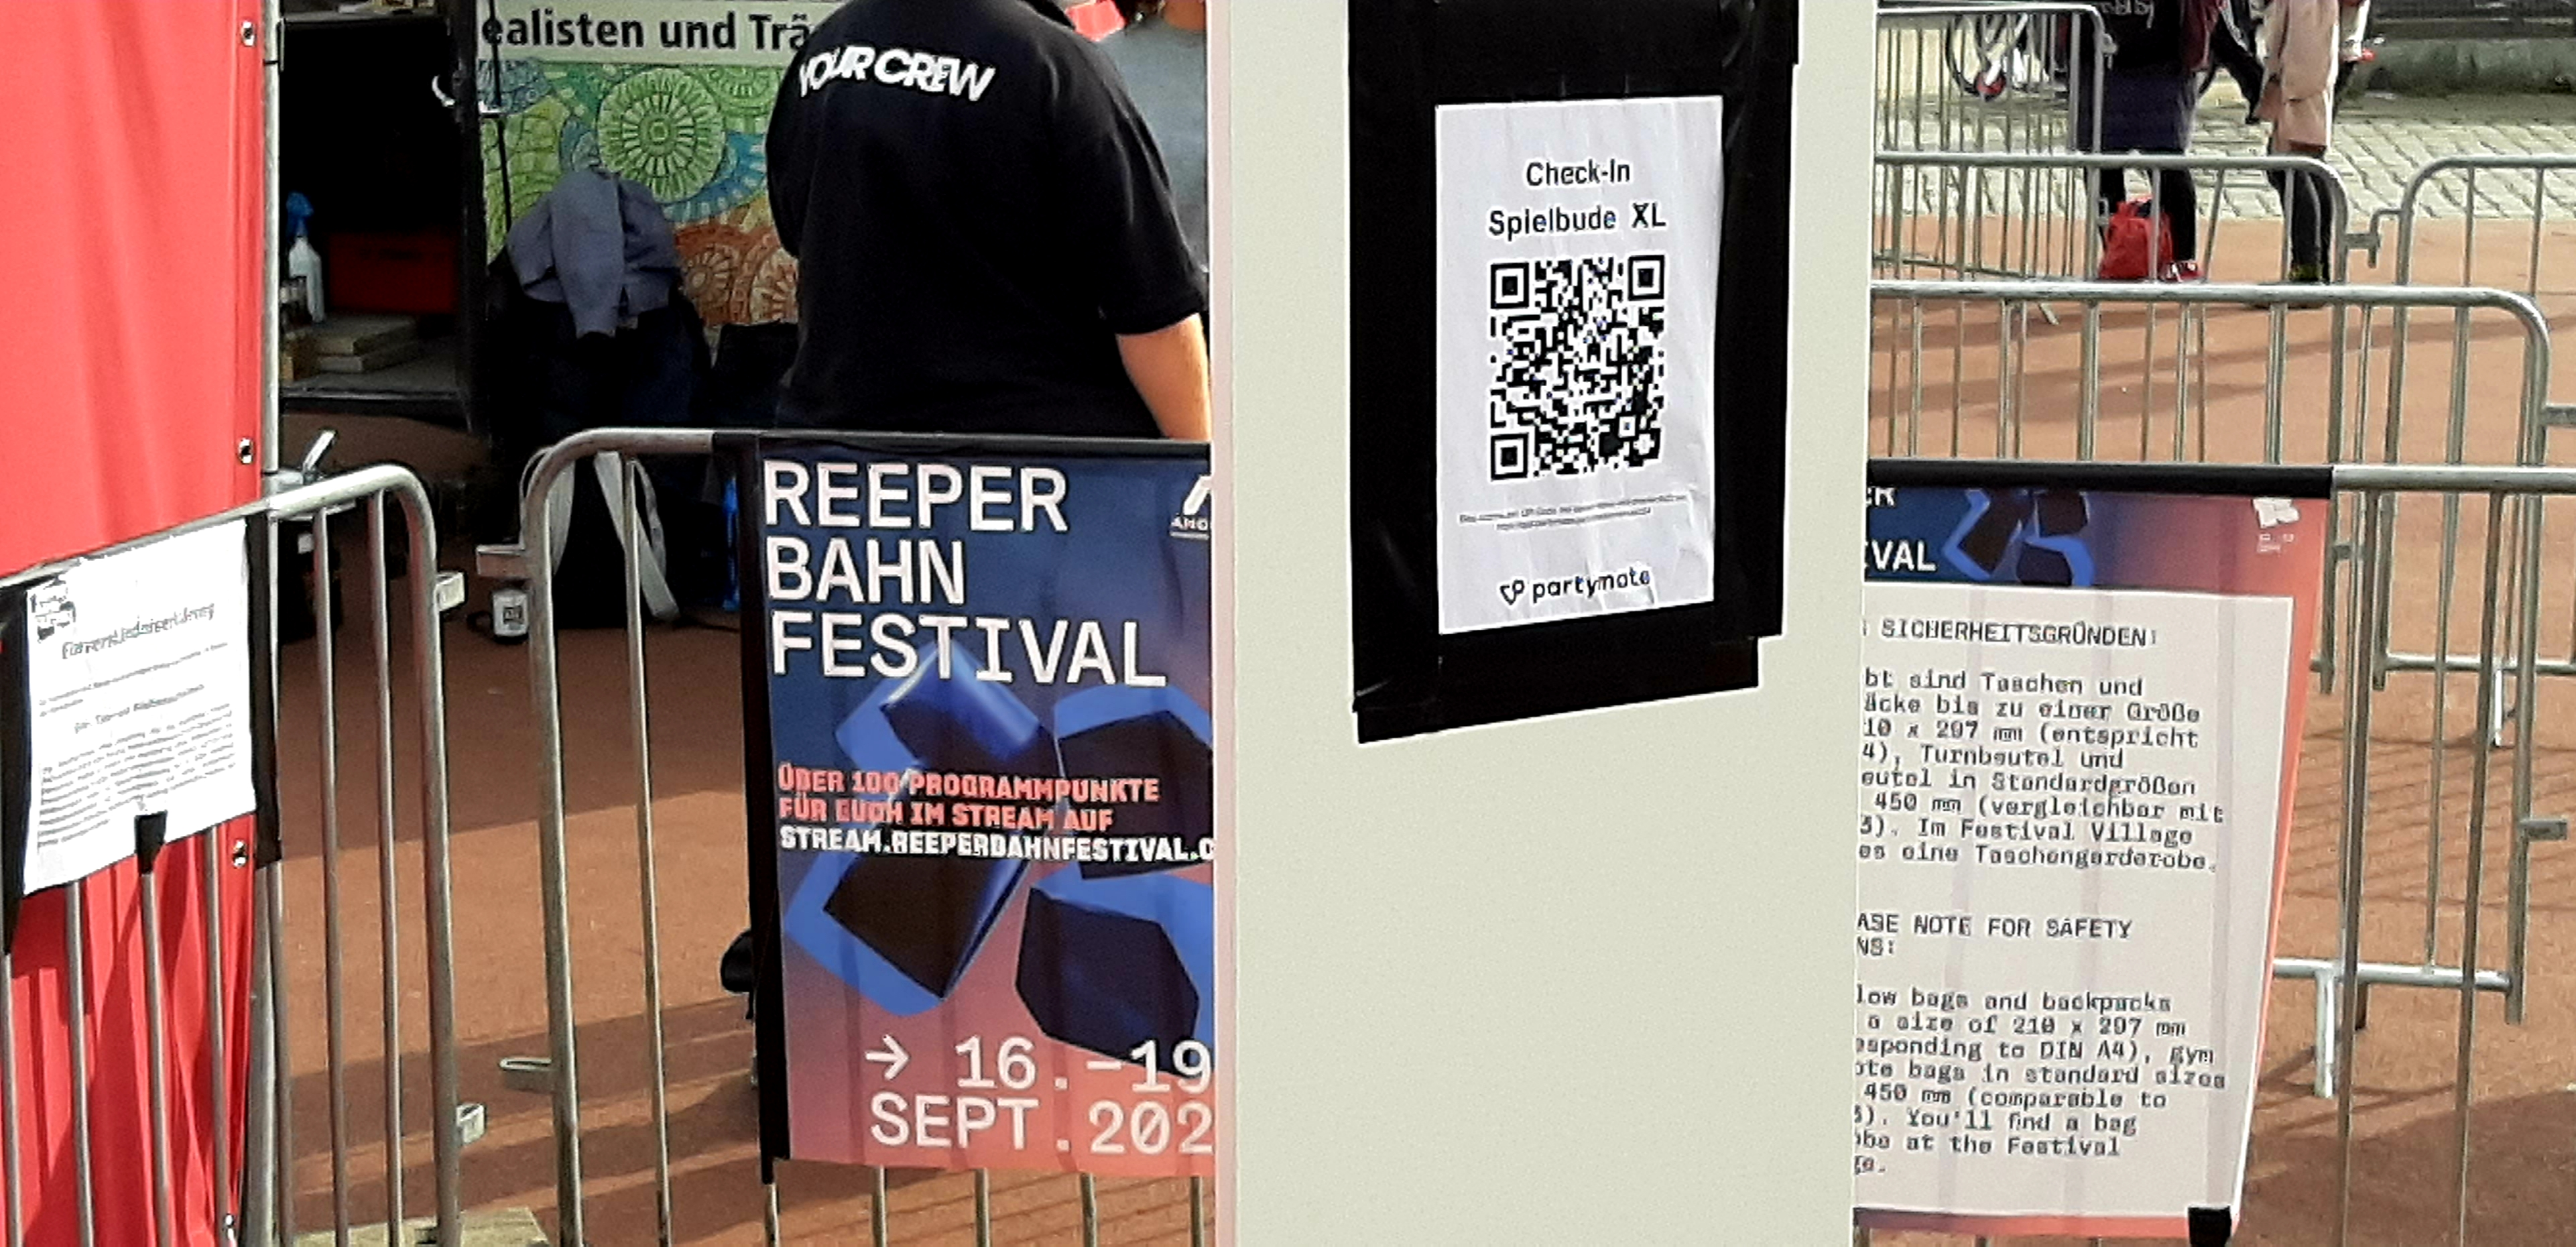 Reeperbahn Festival, Tag 4, Fazit, Spielbudenplatz, Check, Security